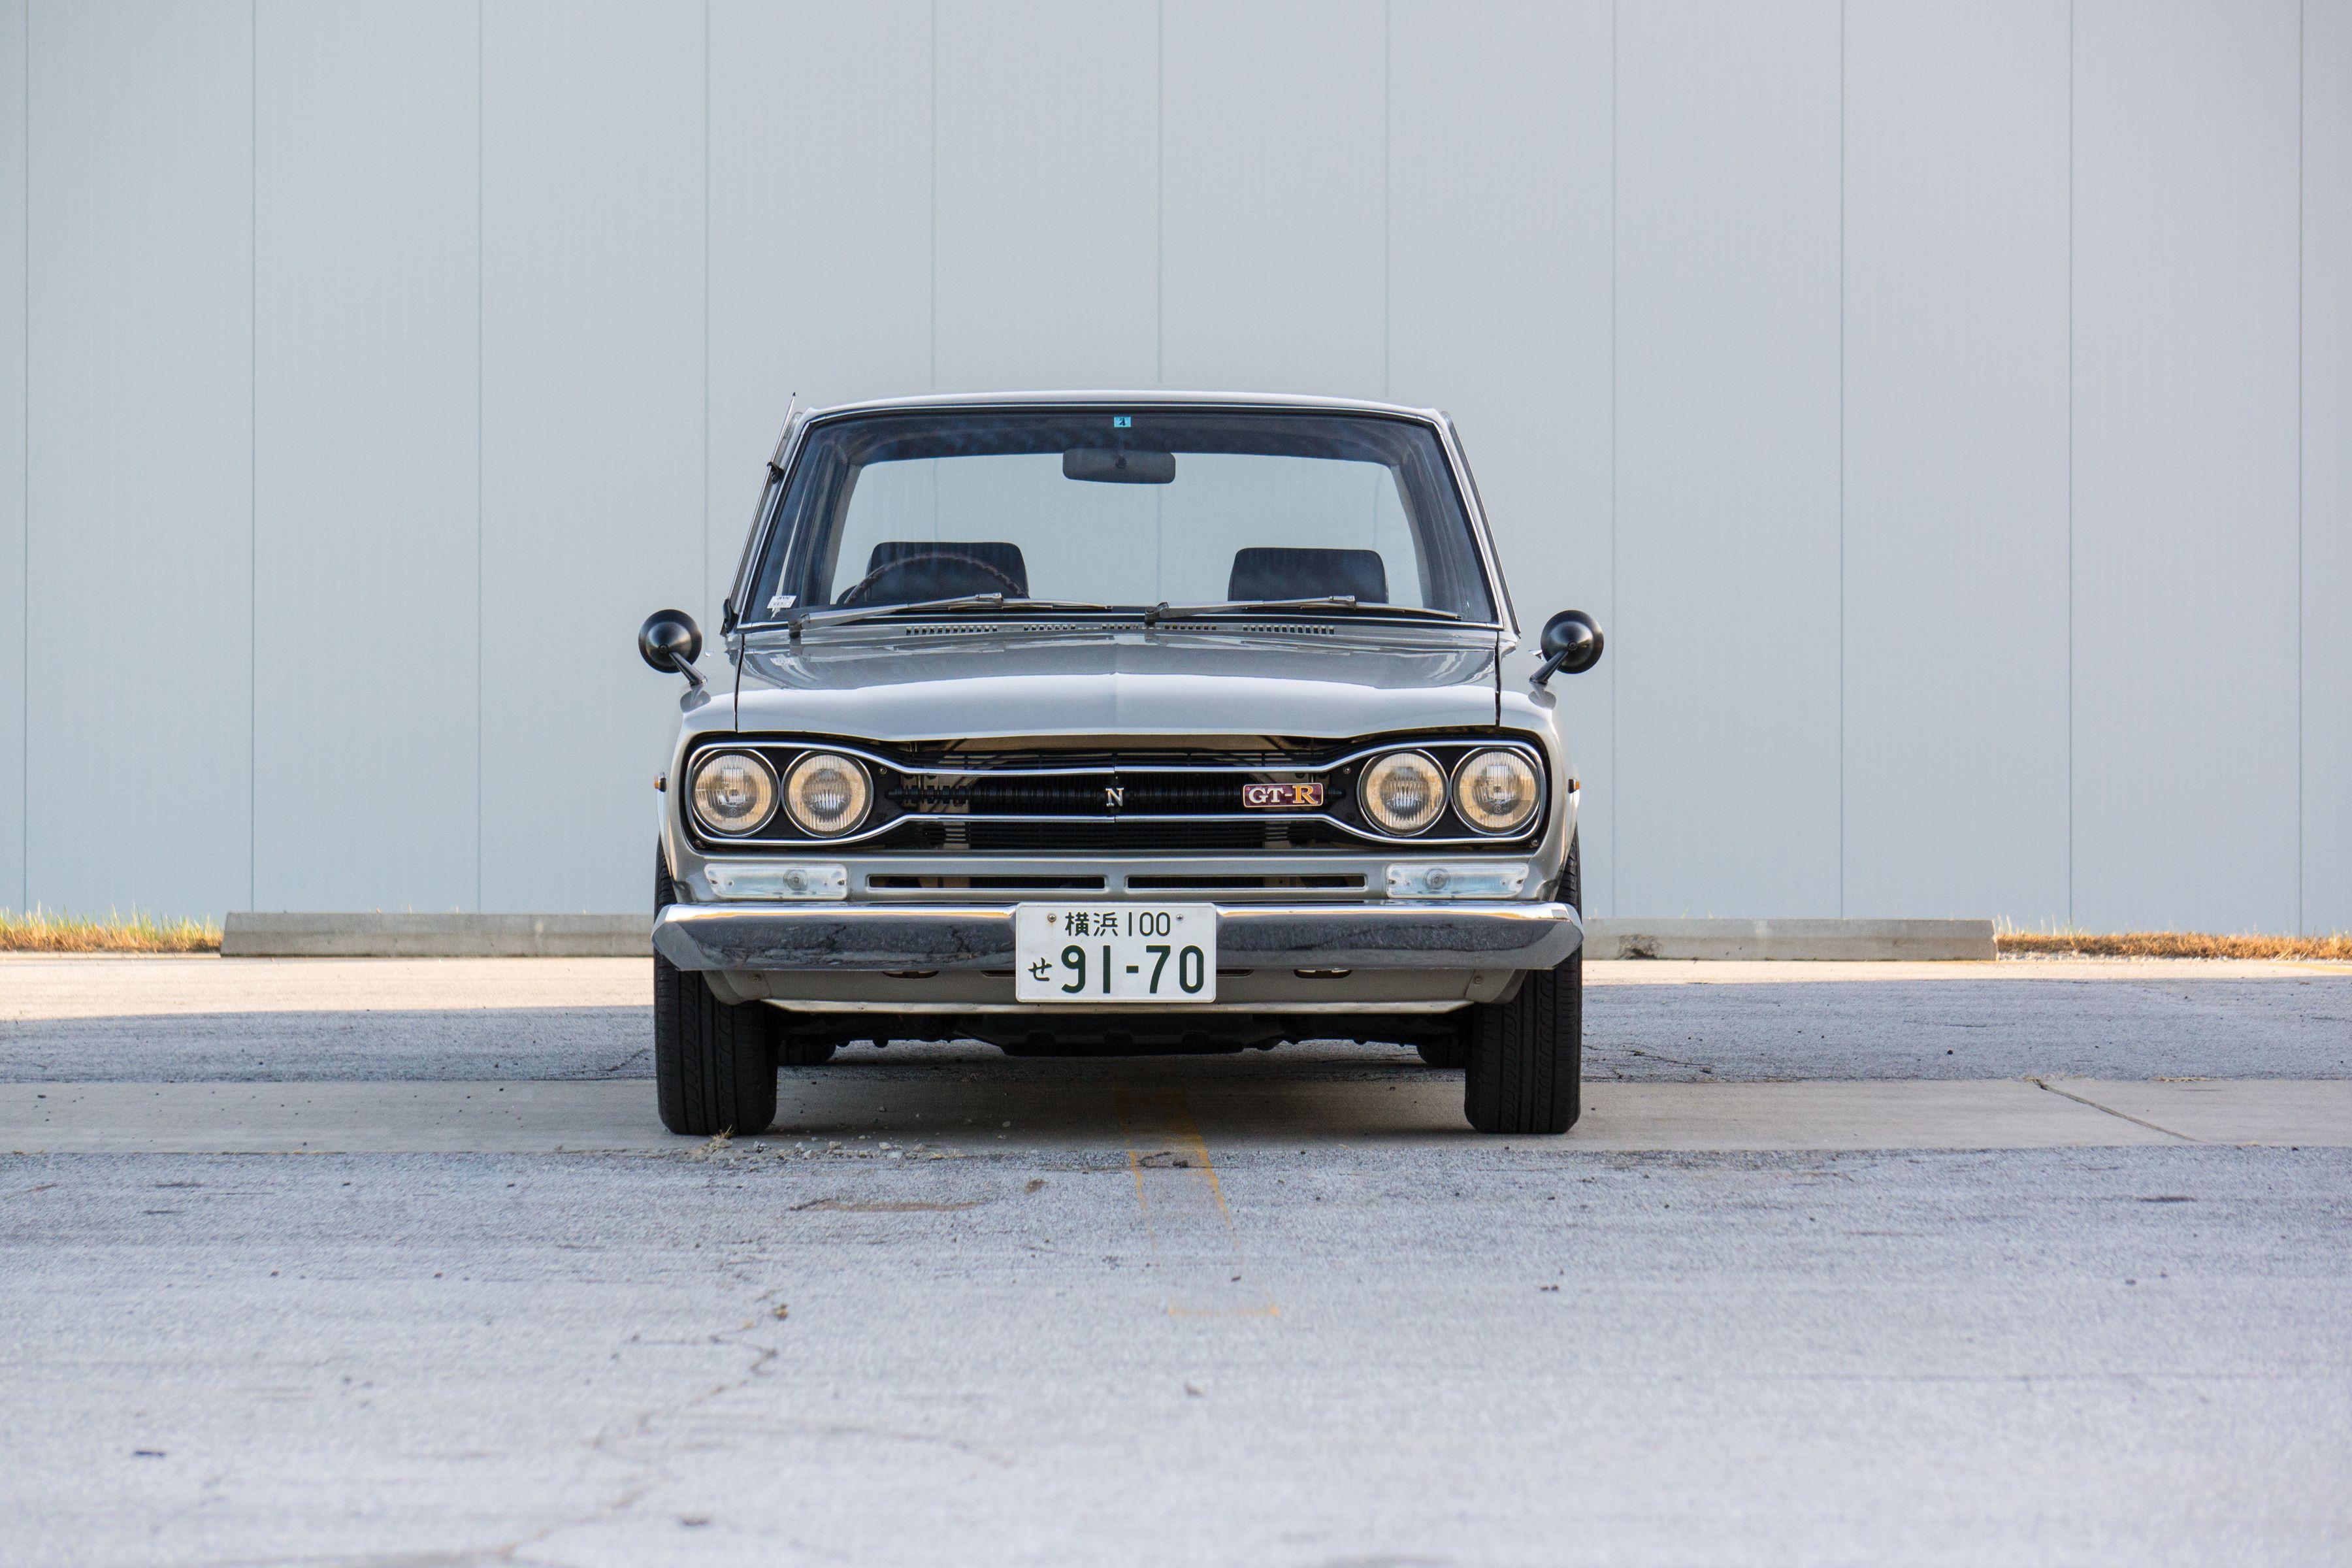 You can drop 6-figures on a classic Skyline GT-R sedan